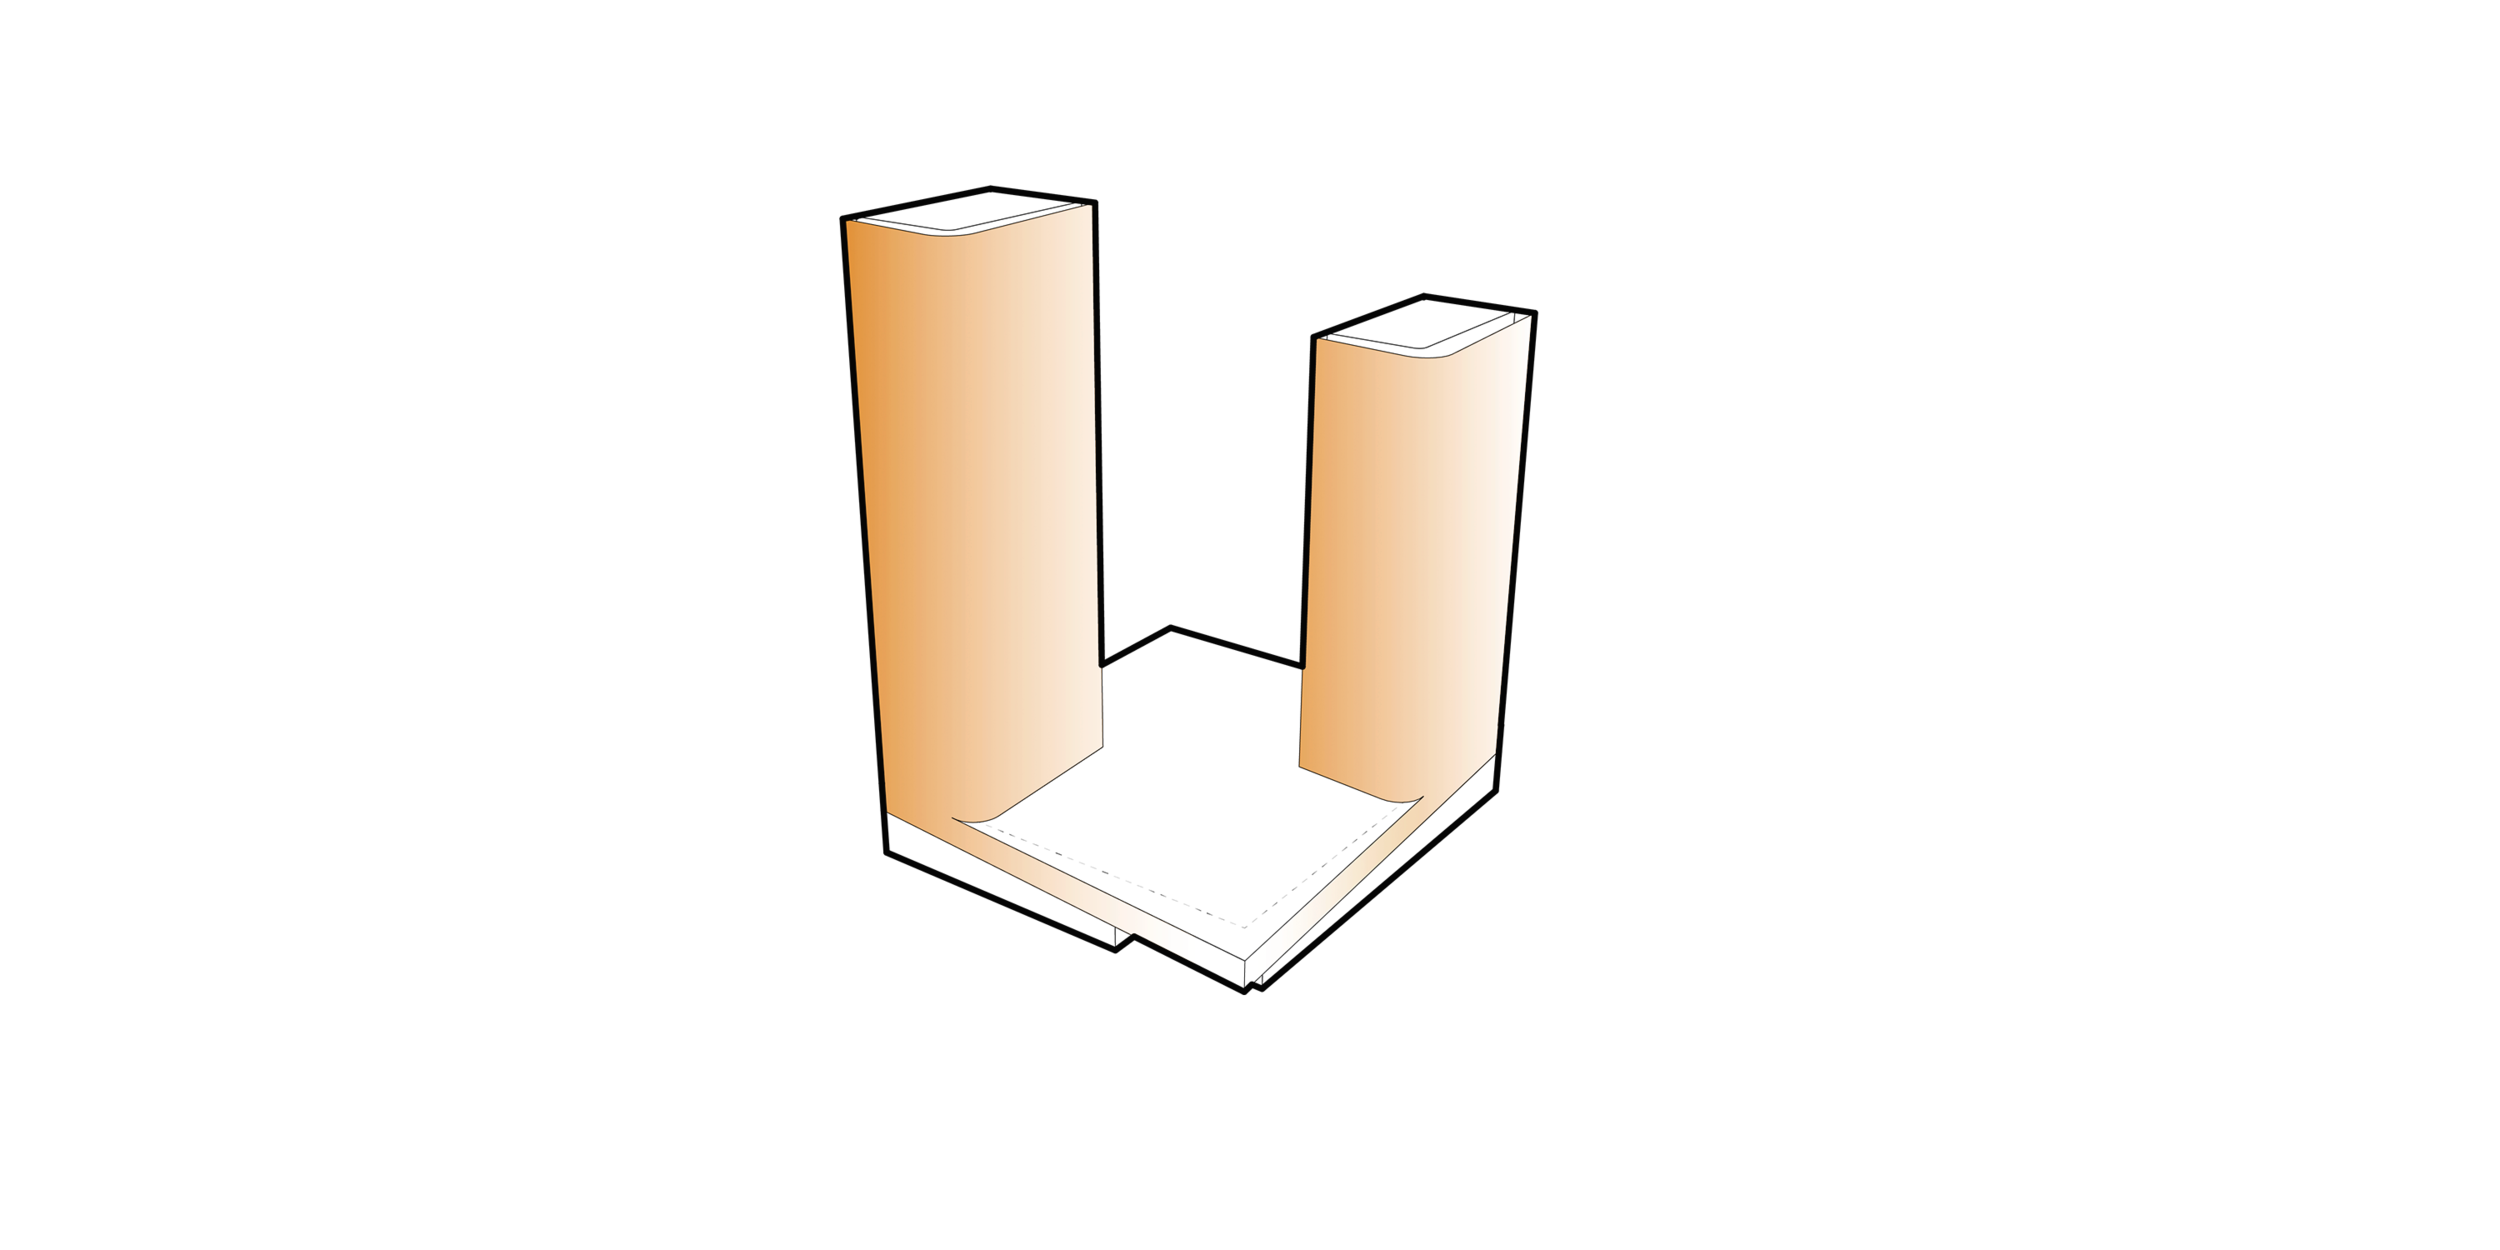 WBCG_Talan_DiagramReel-4.png